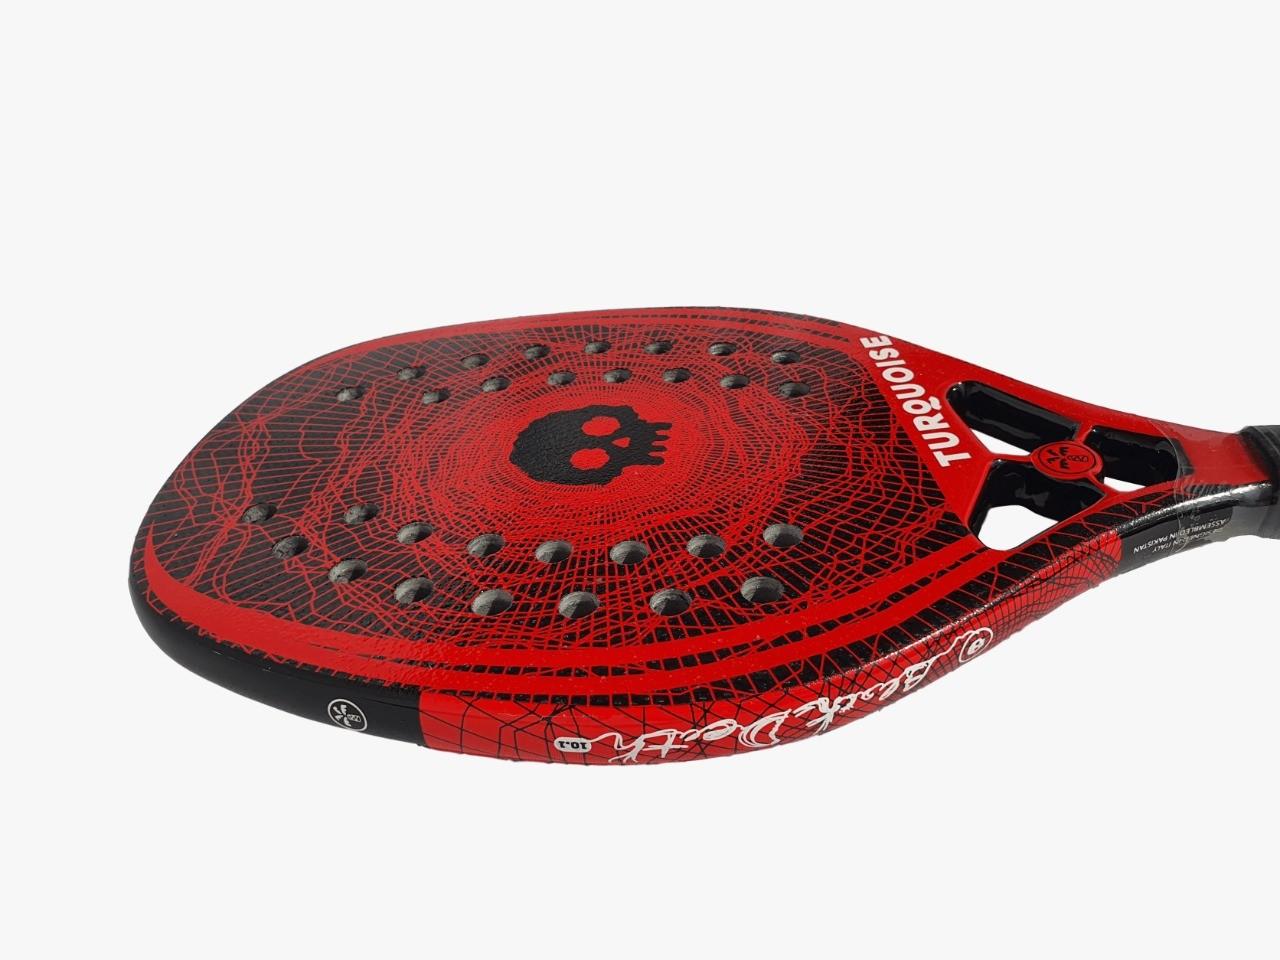 Raquete de Beach Tennis Turquoise Black Death 10.1 2020 Vermelha